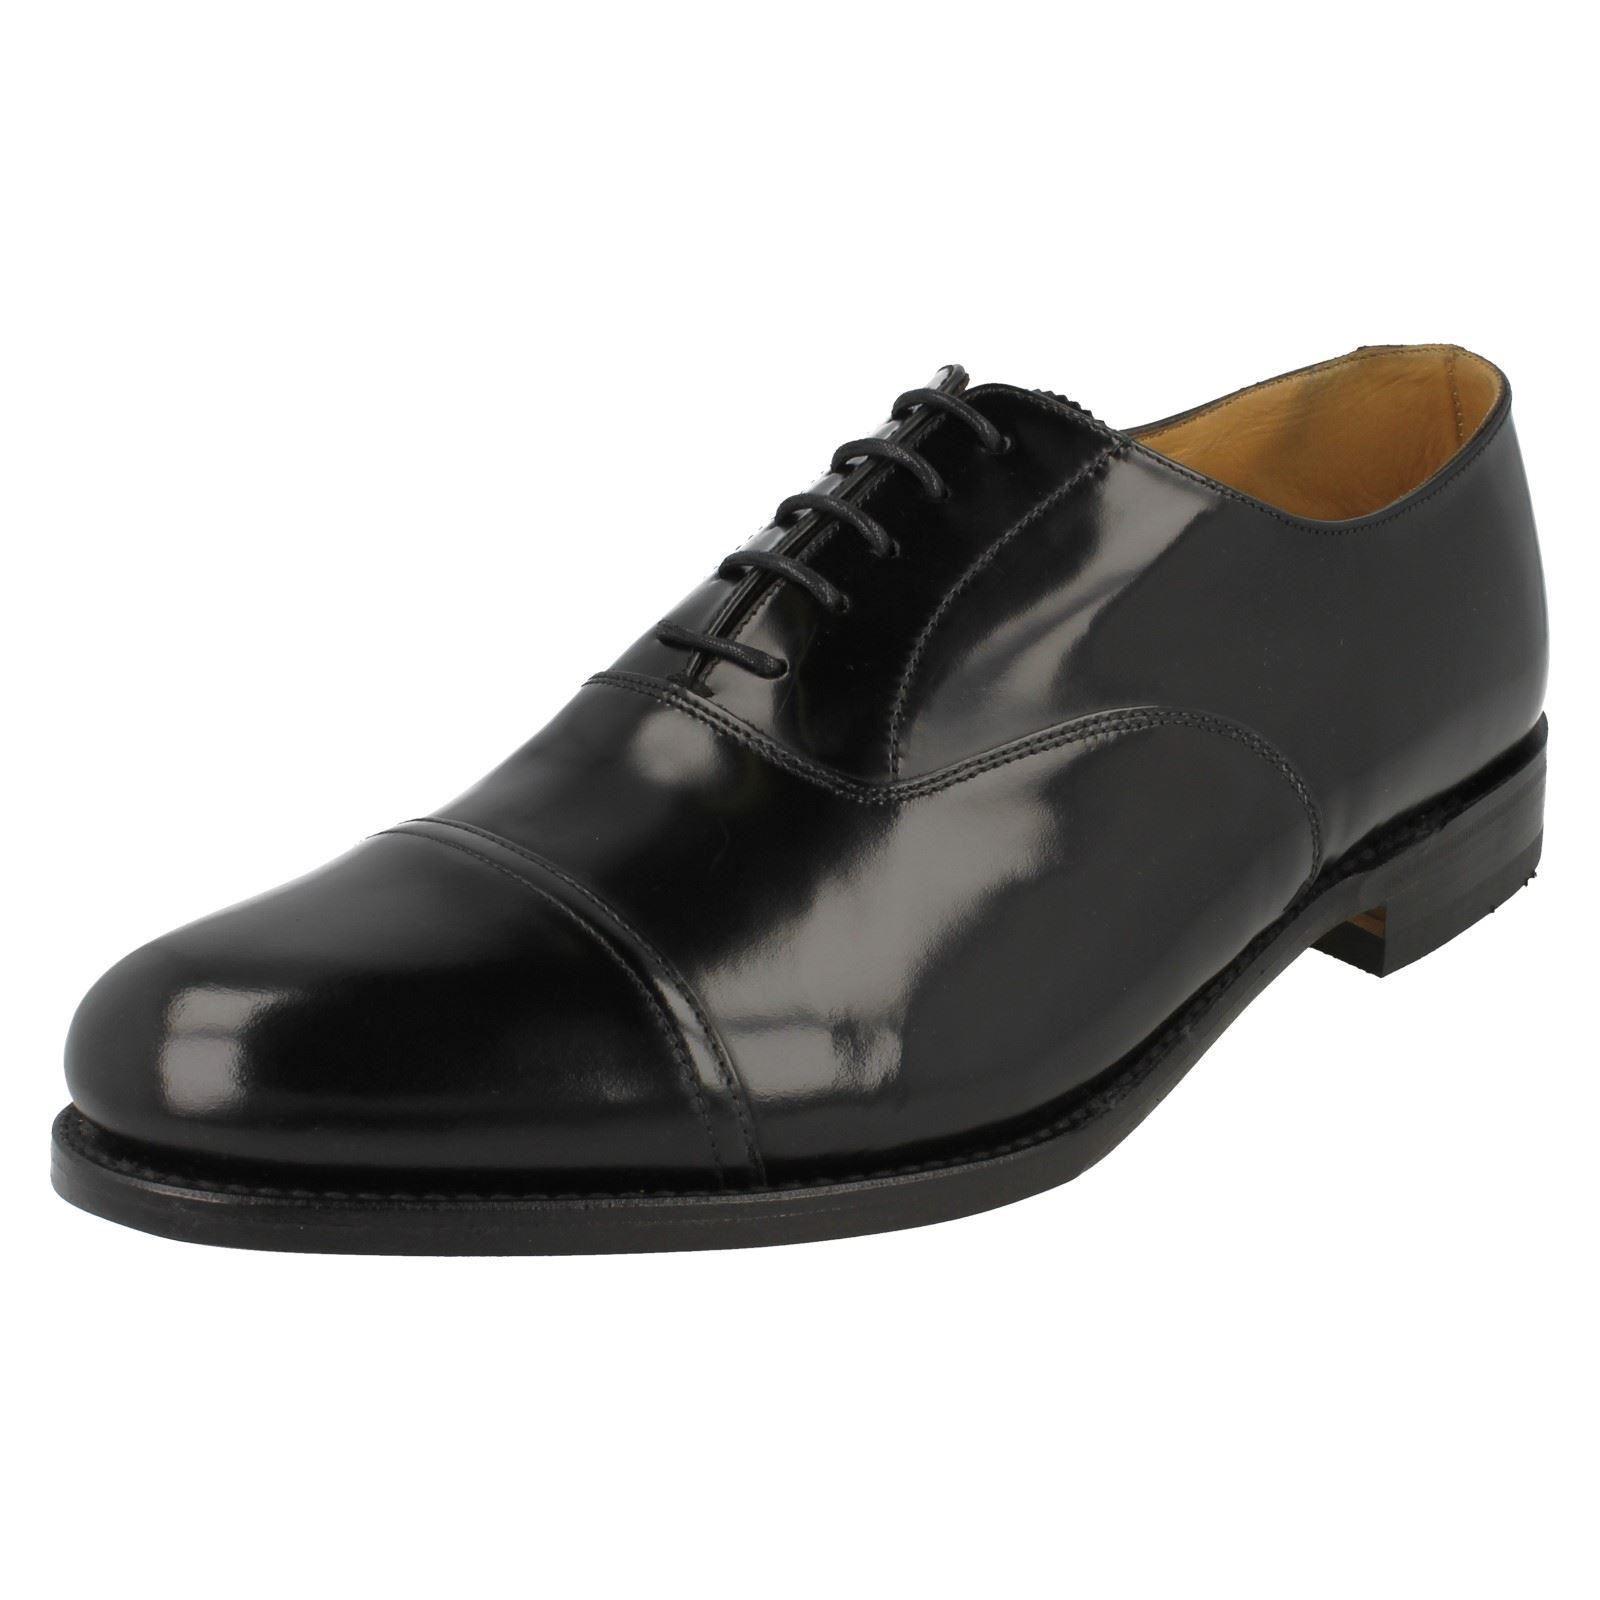 Men's Loake Lace Up Schuhes - Elland (Shop Soiled)